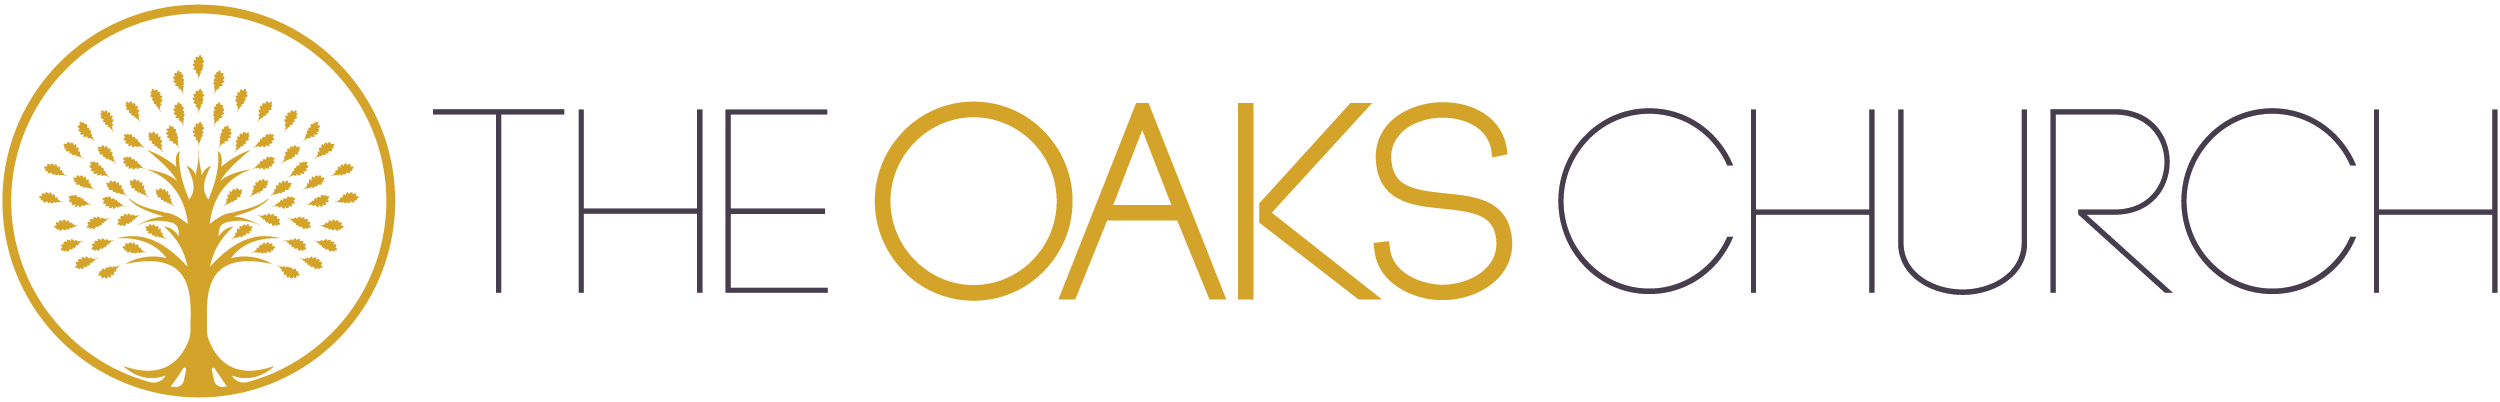 The-Oaks-Church_CMYK_Horizontal.jpg